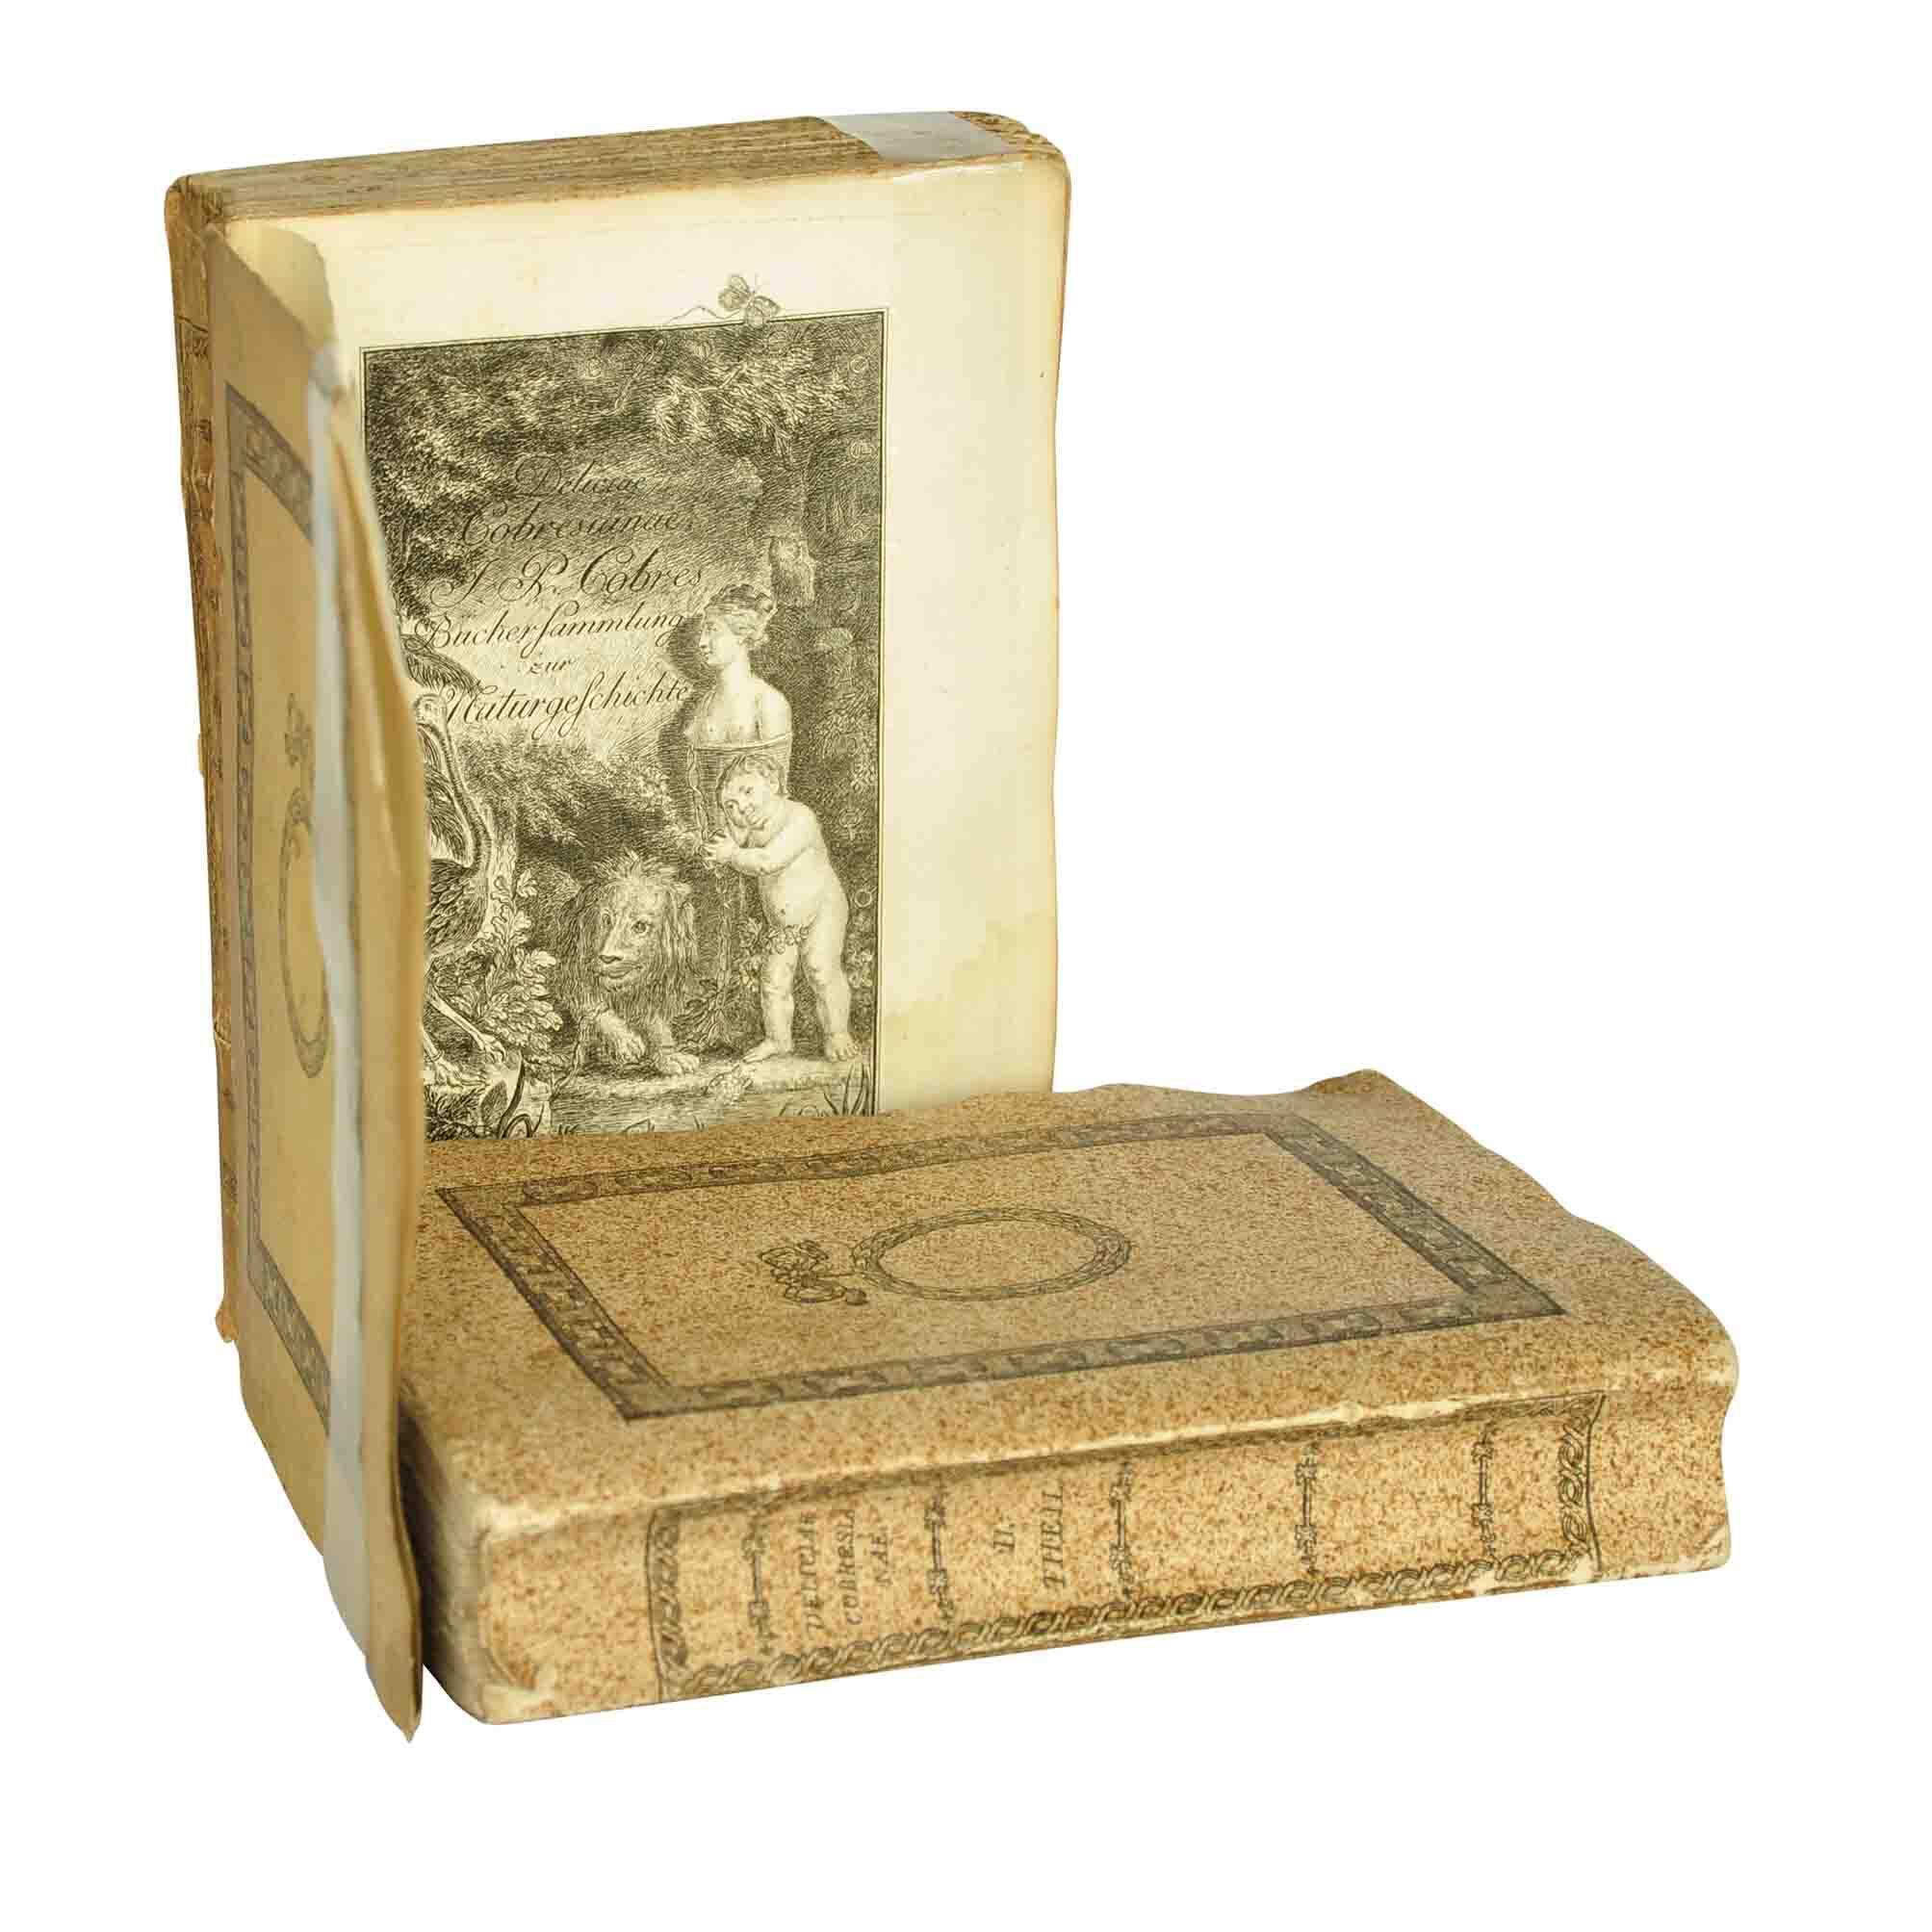 Cobres Deliciae Cobresianae 1782 Cover Title A N